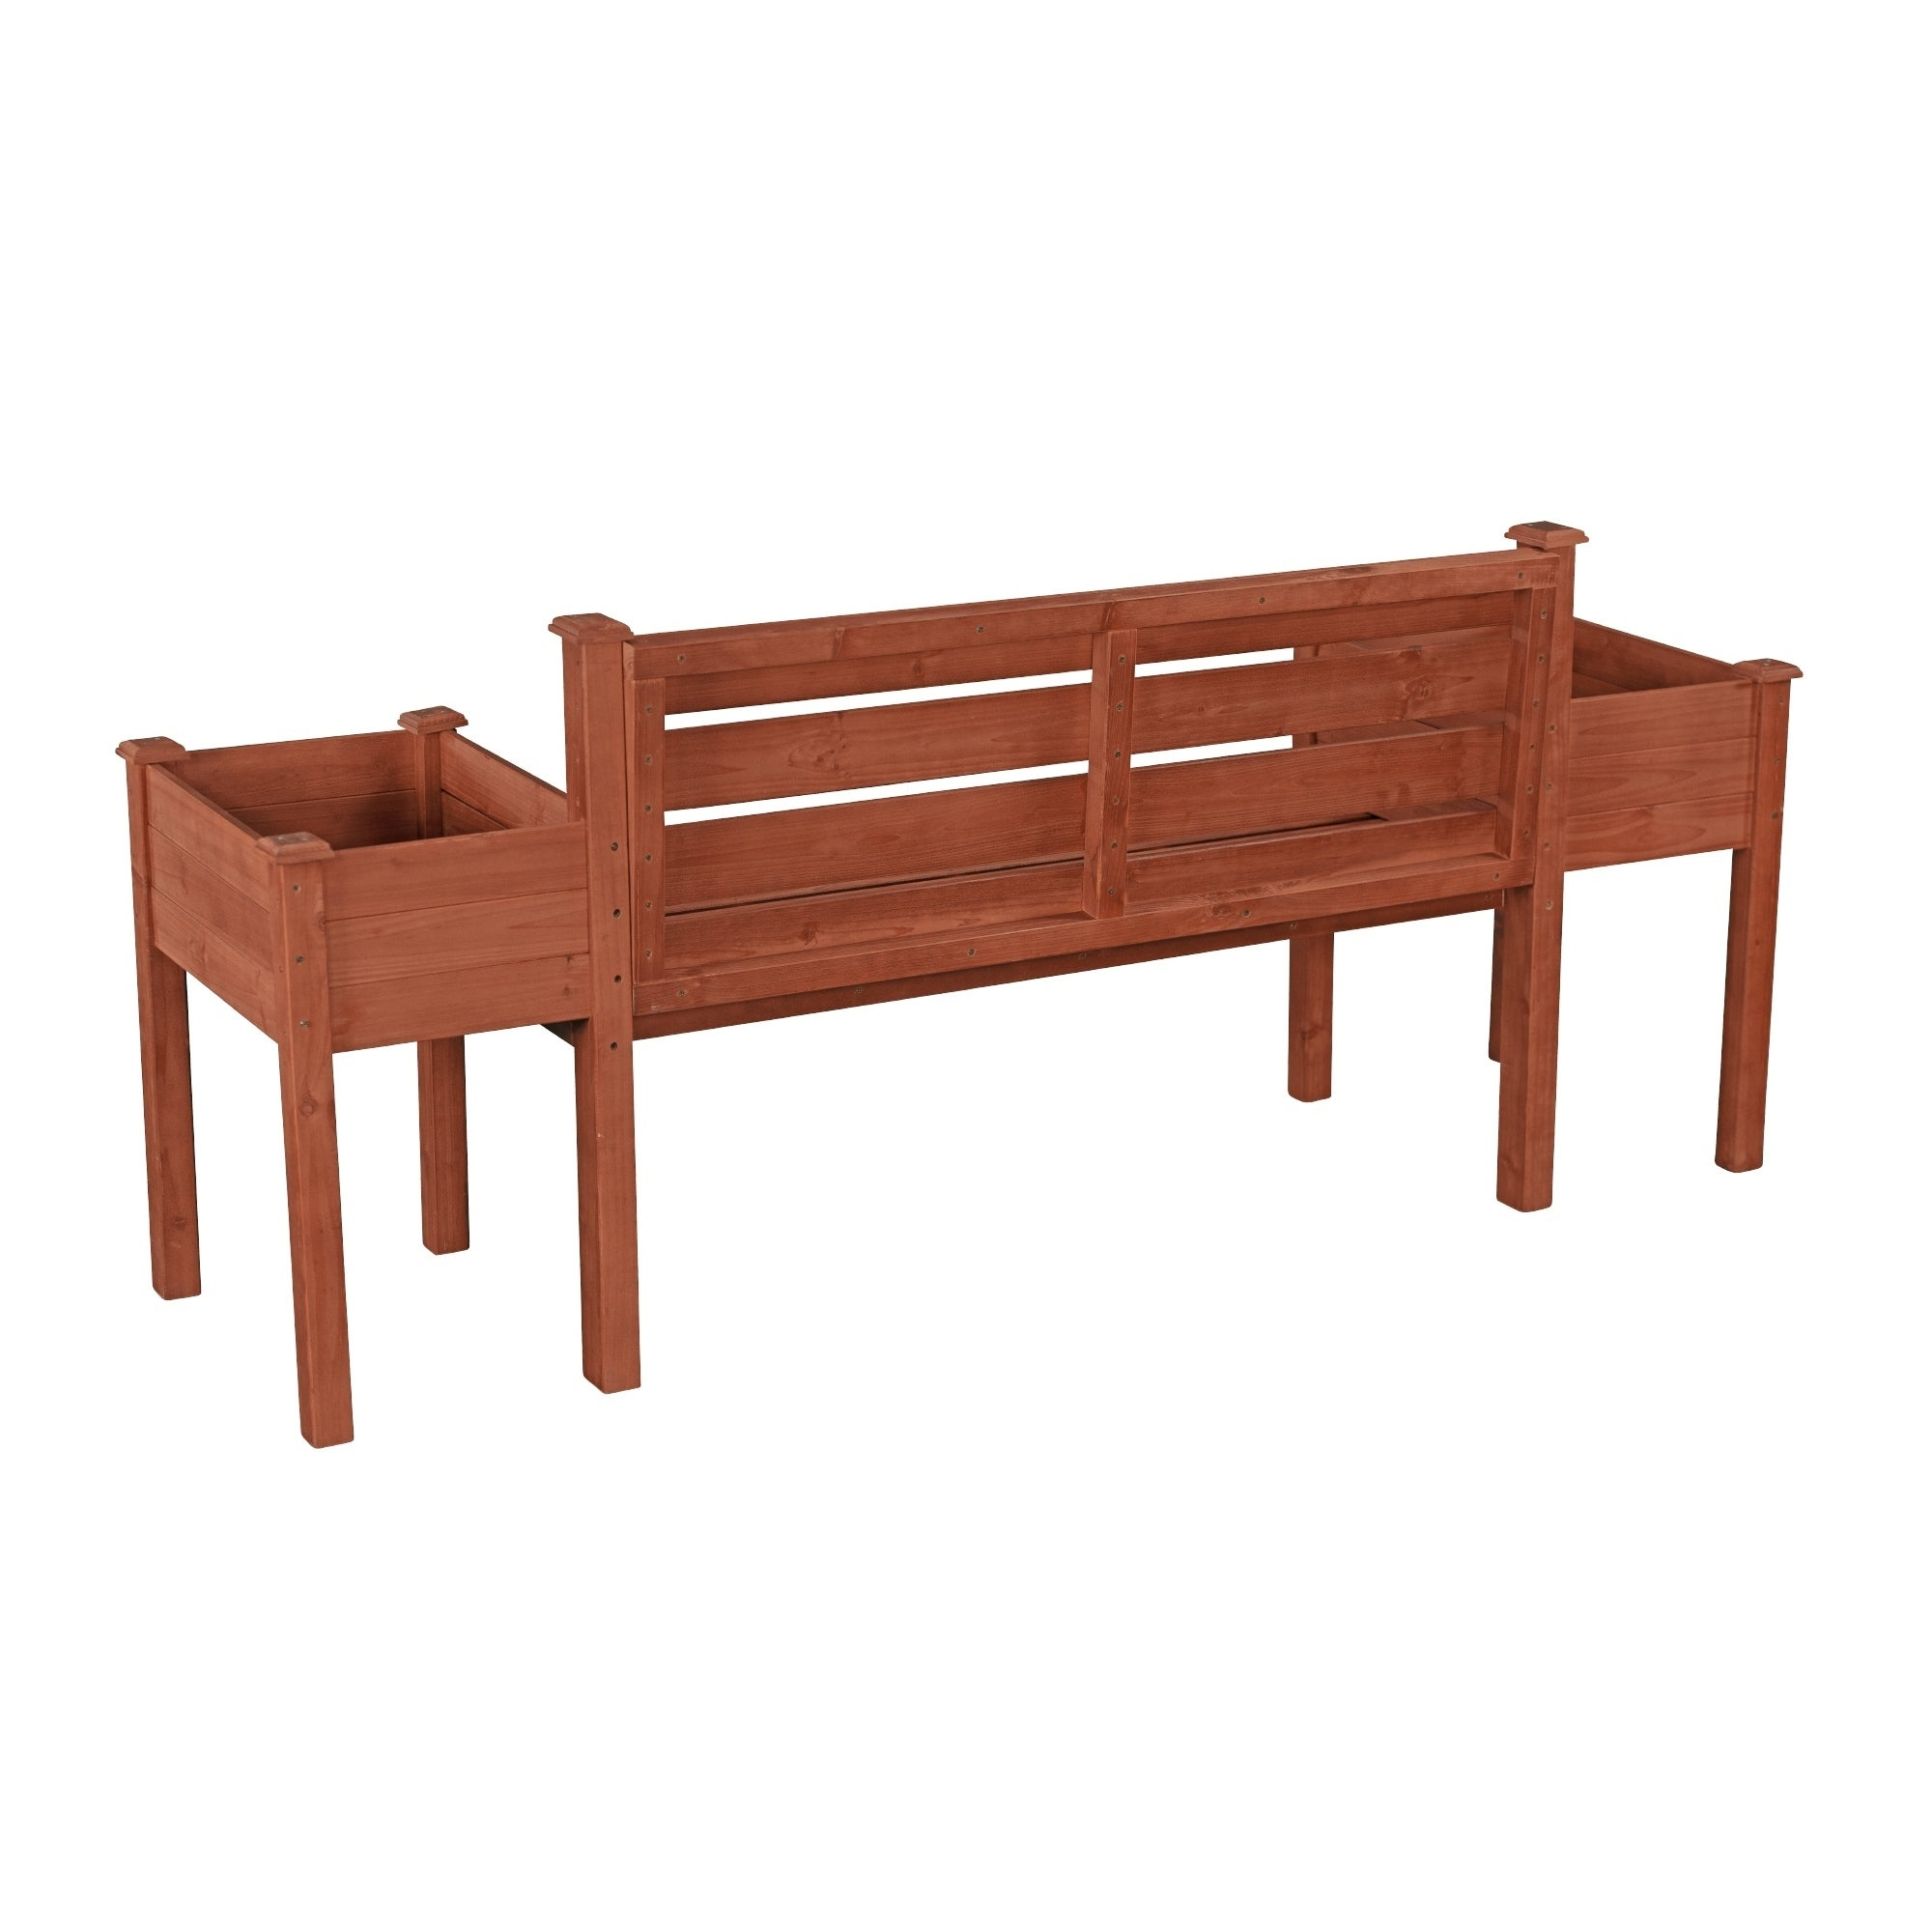 Wood Planter Bench Overstock 10988809